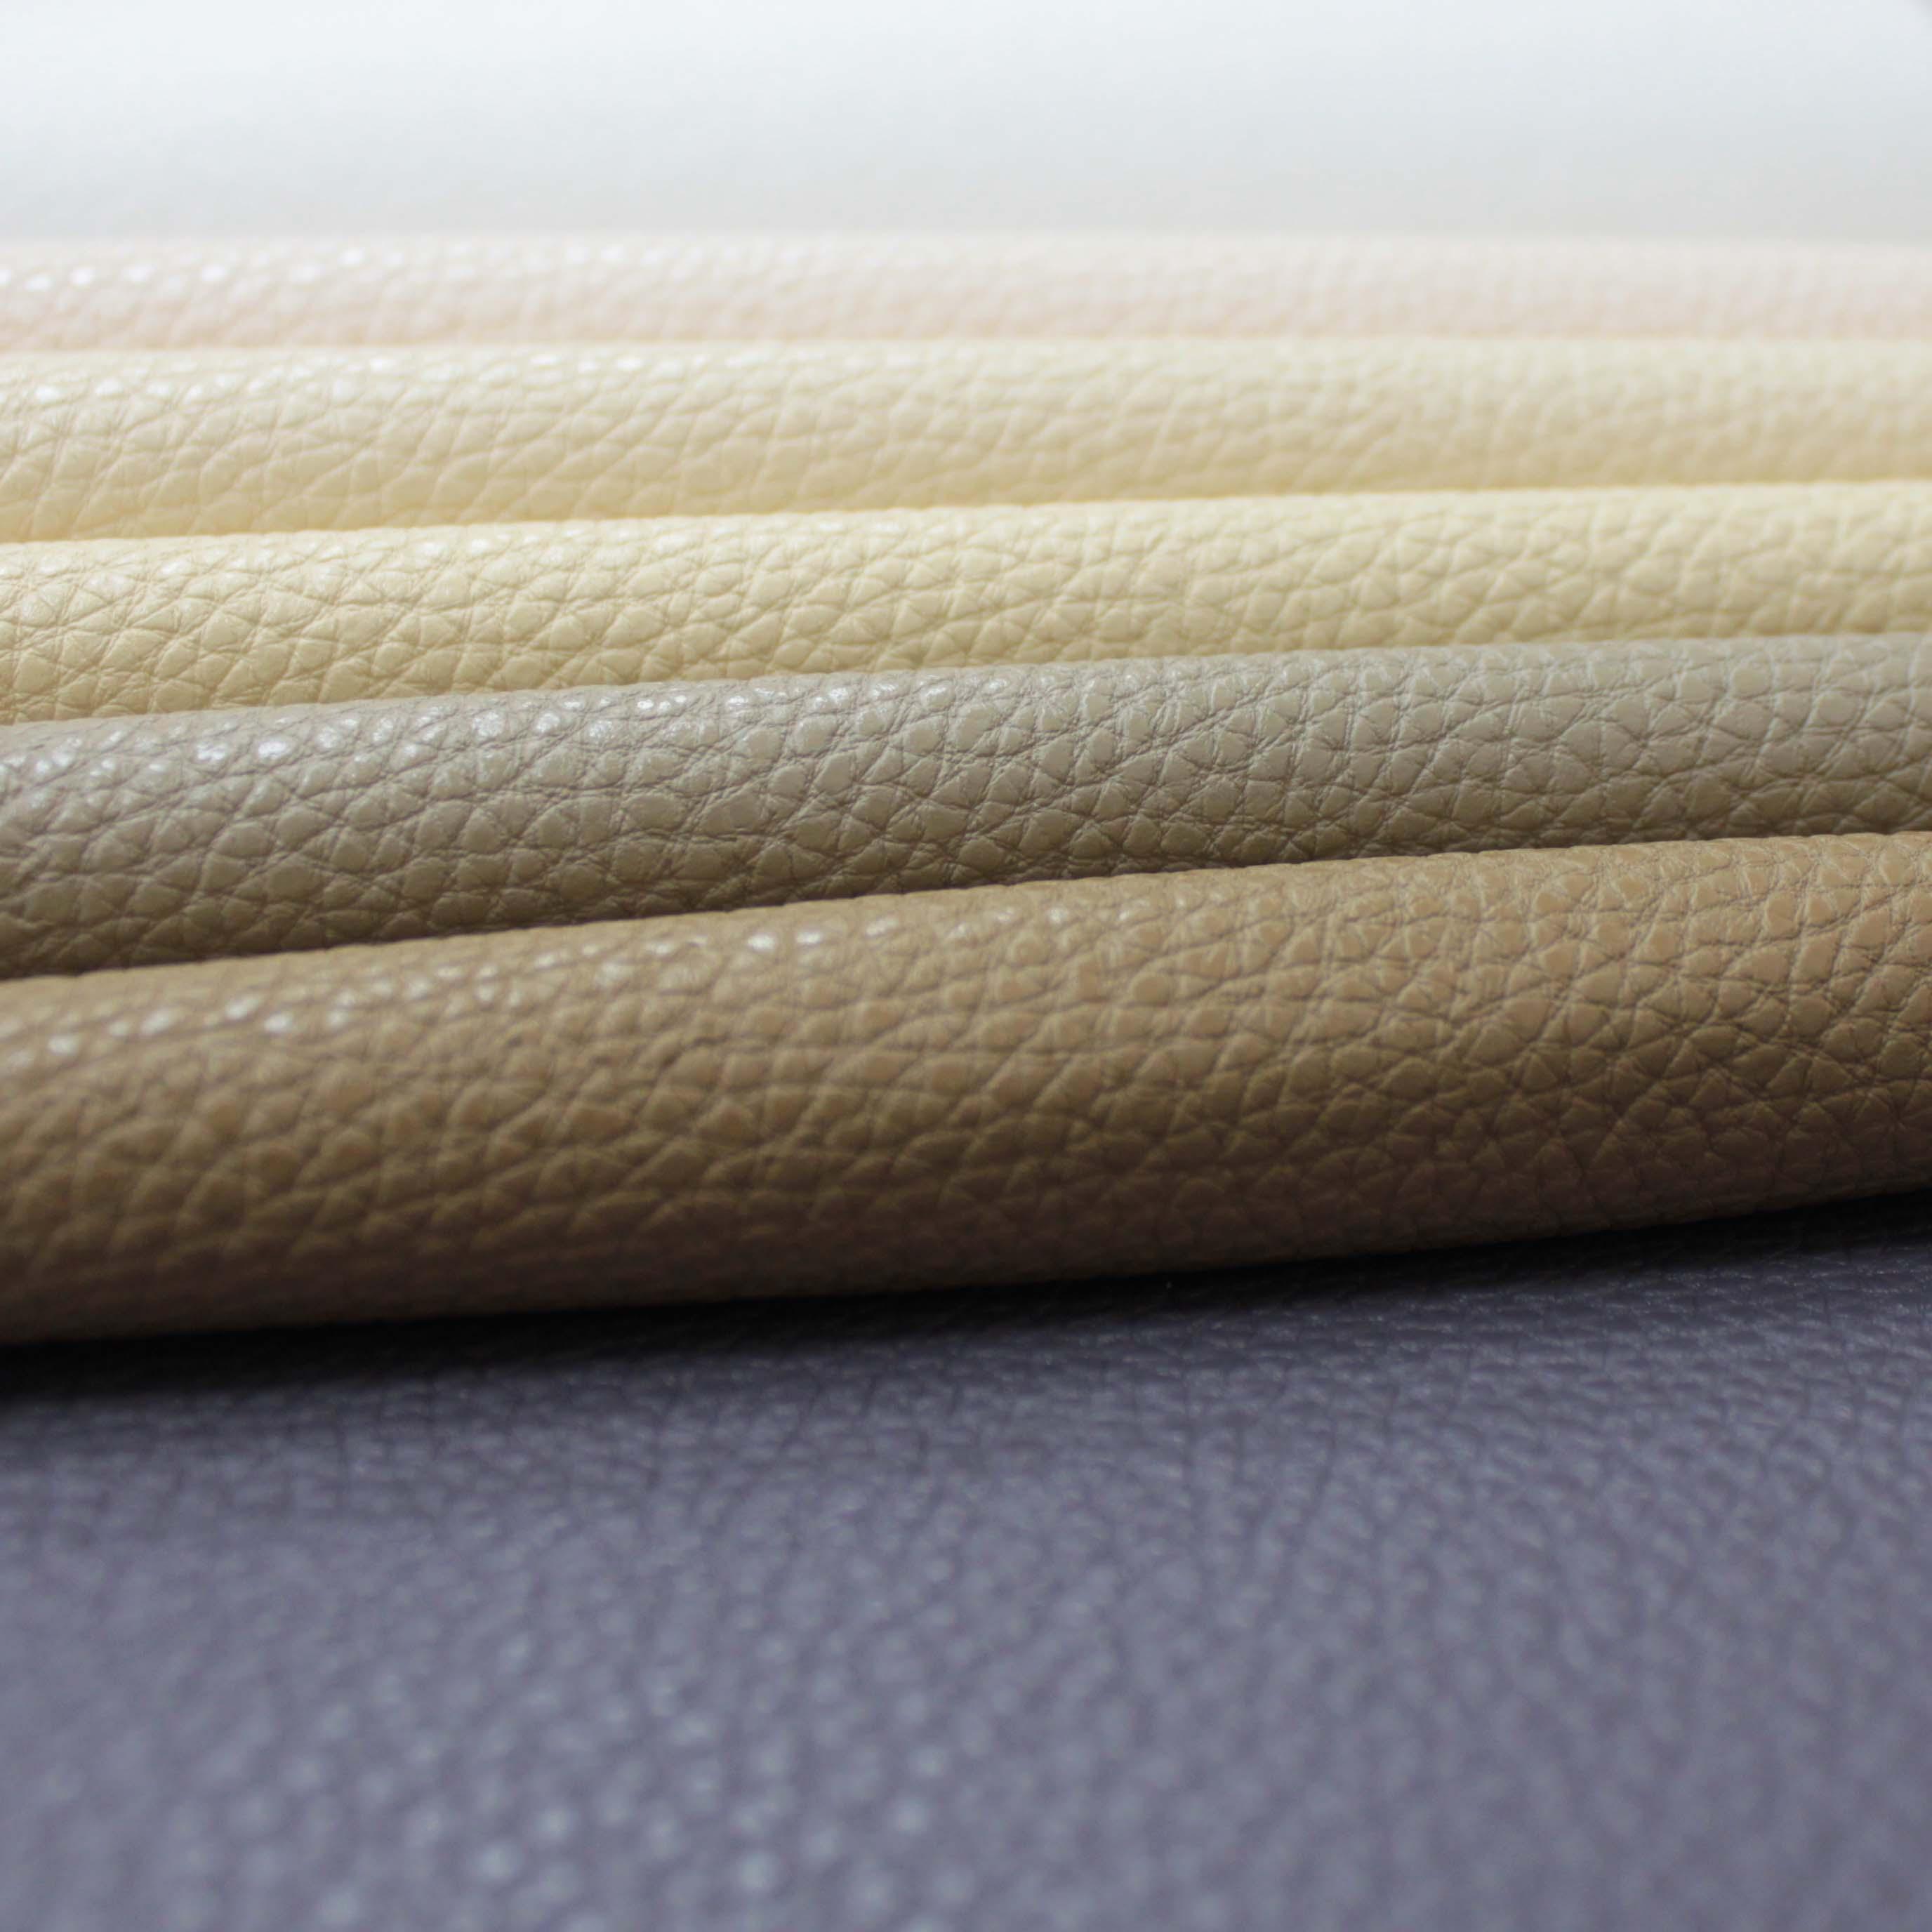 Текстиль Bionica Collection